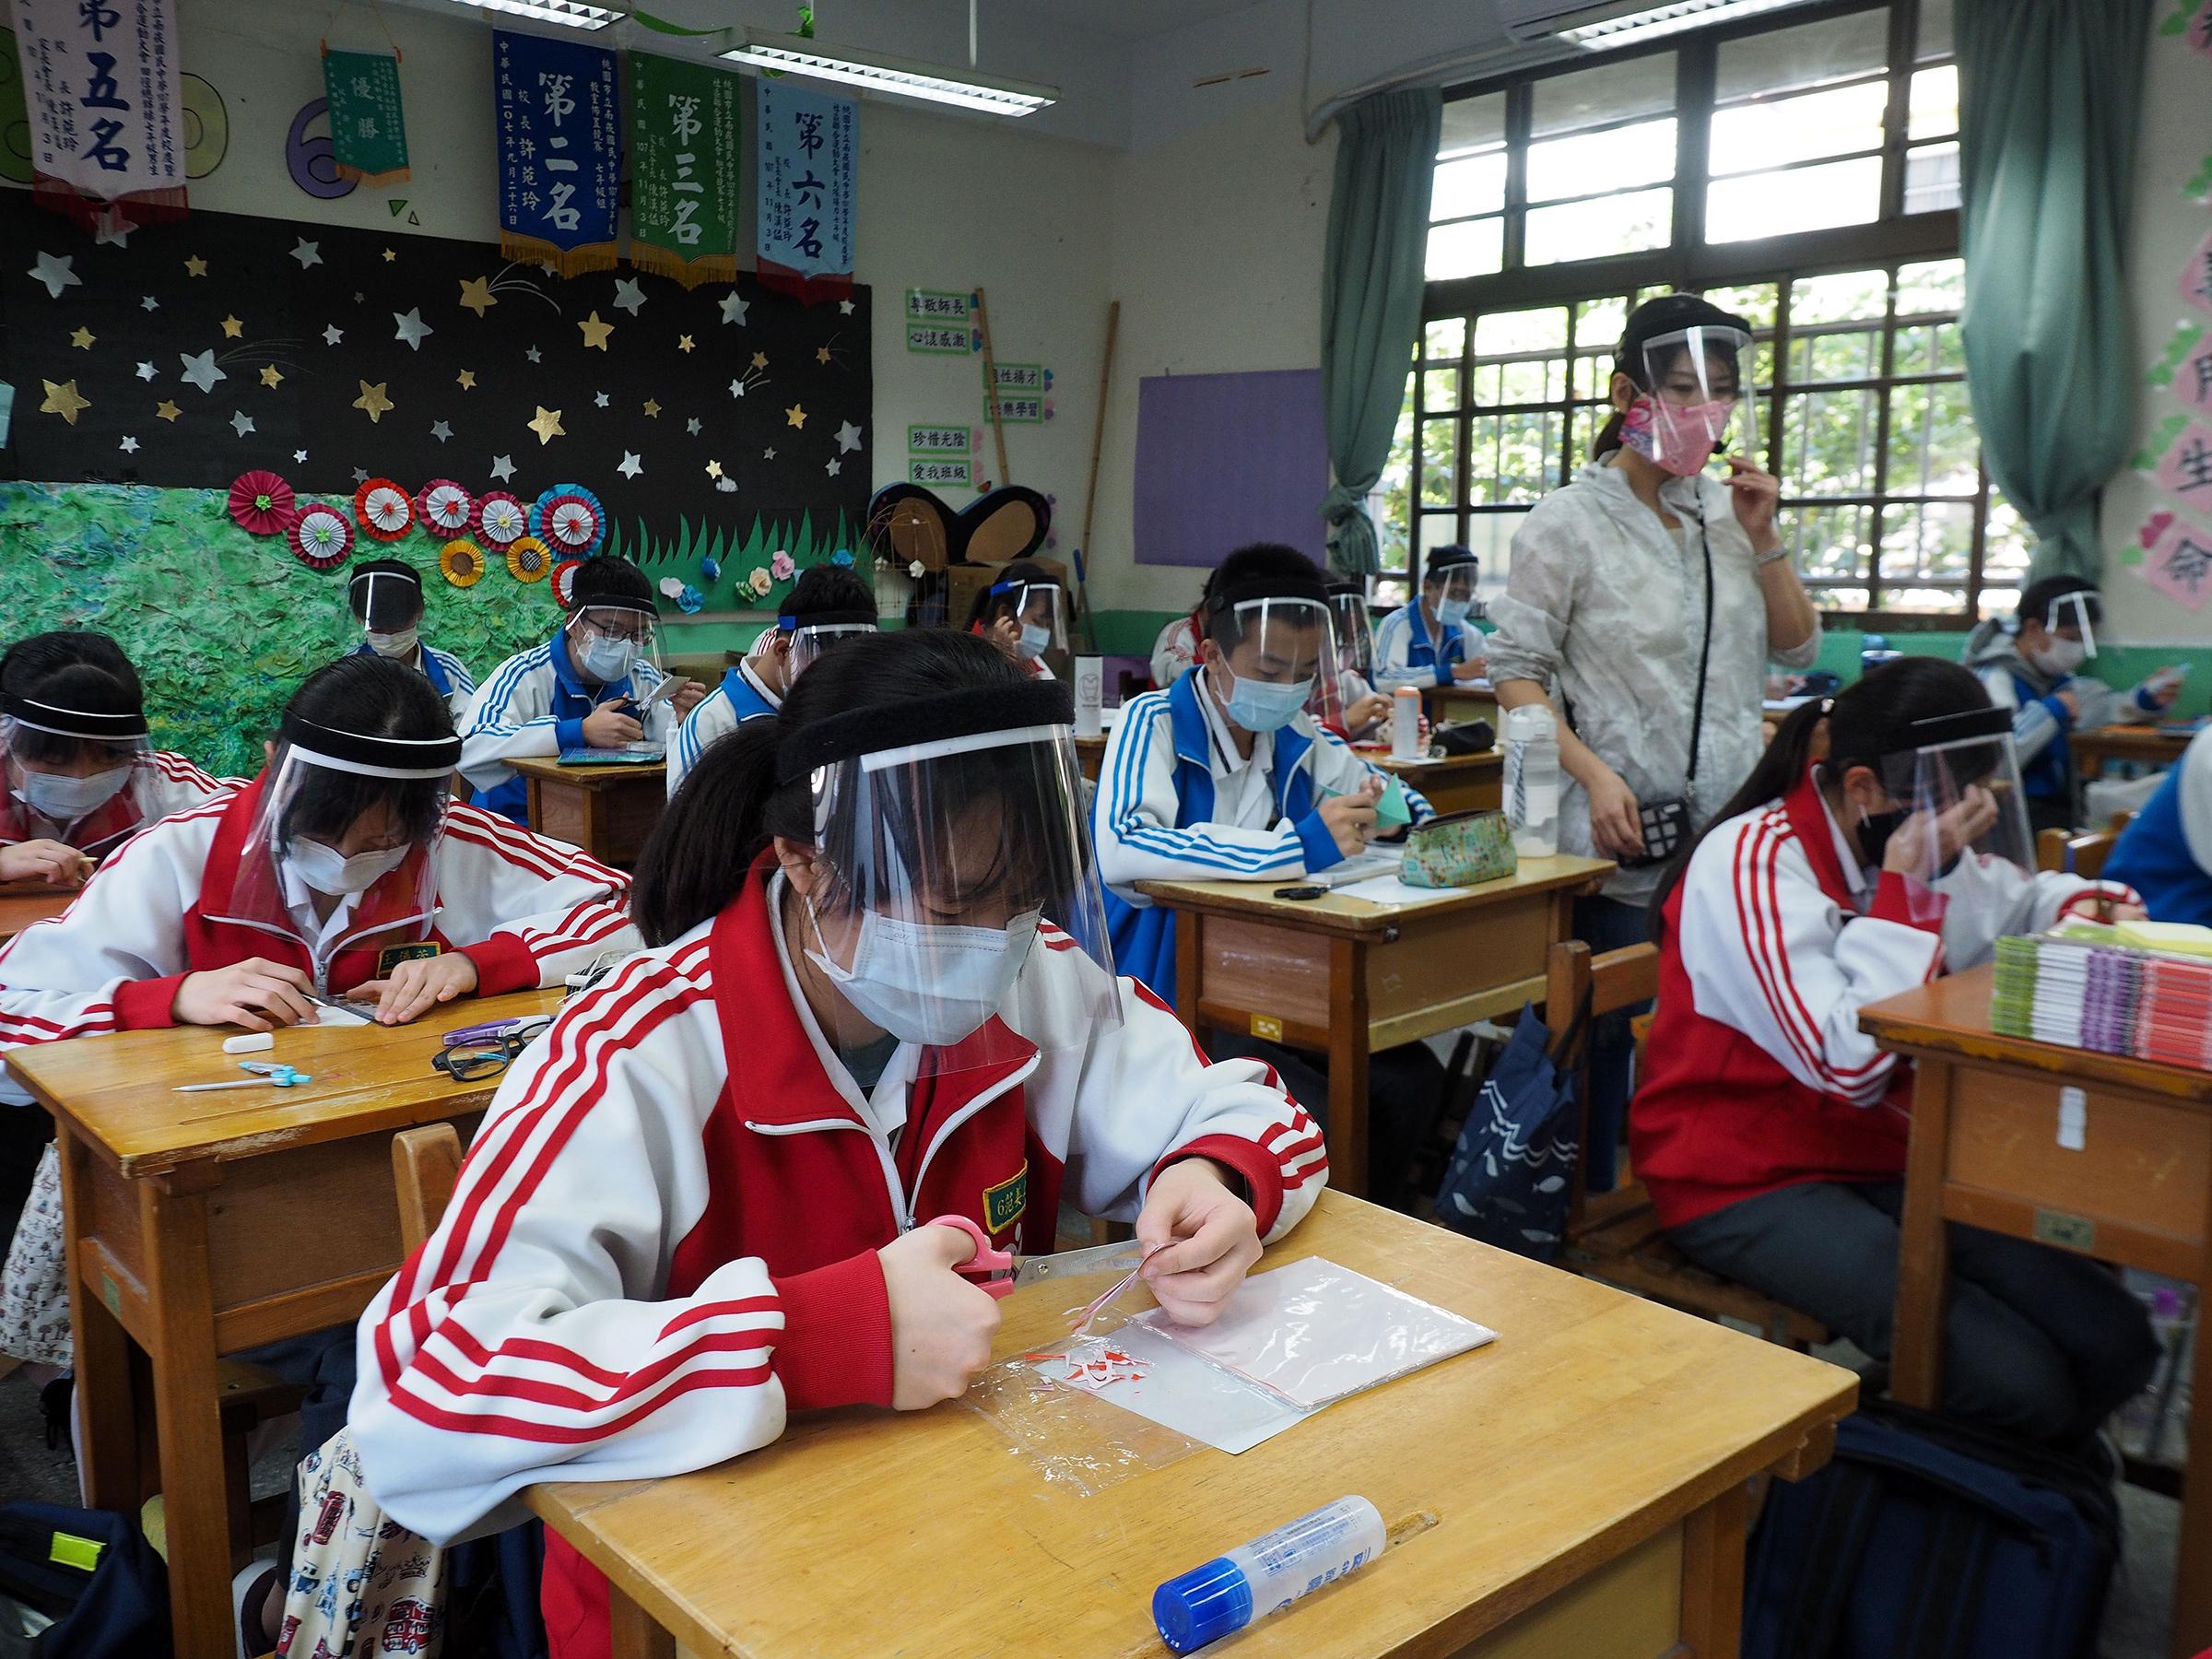 Desk Dividers Classroom Student